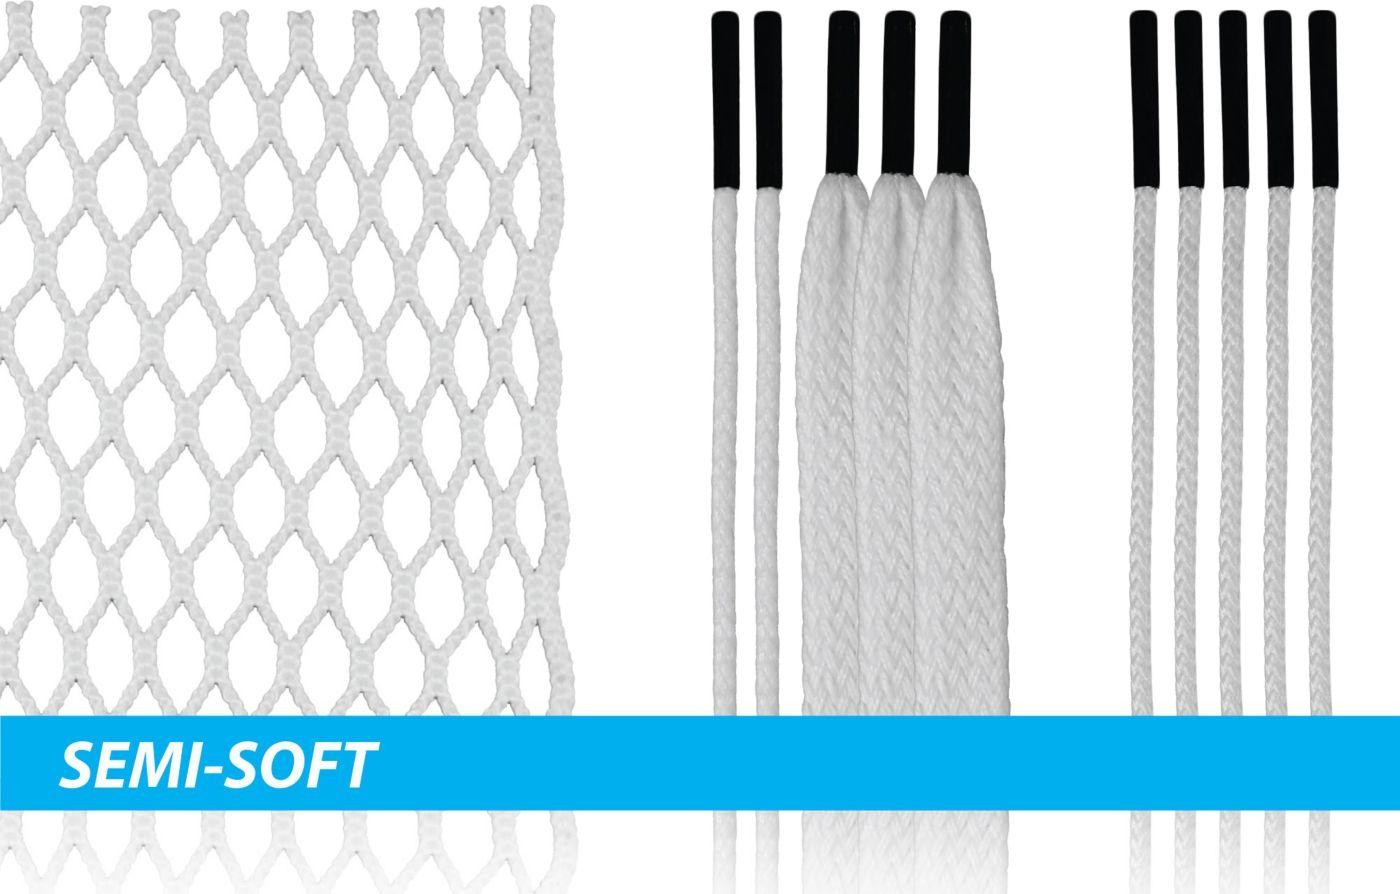 ECD Lacrosse HeroMesh 2.0 Semi-Soft Complete Stringing Kit